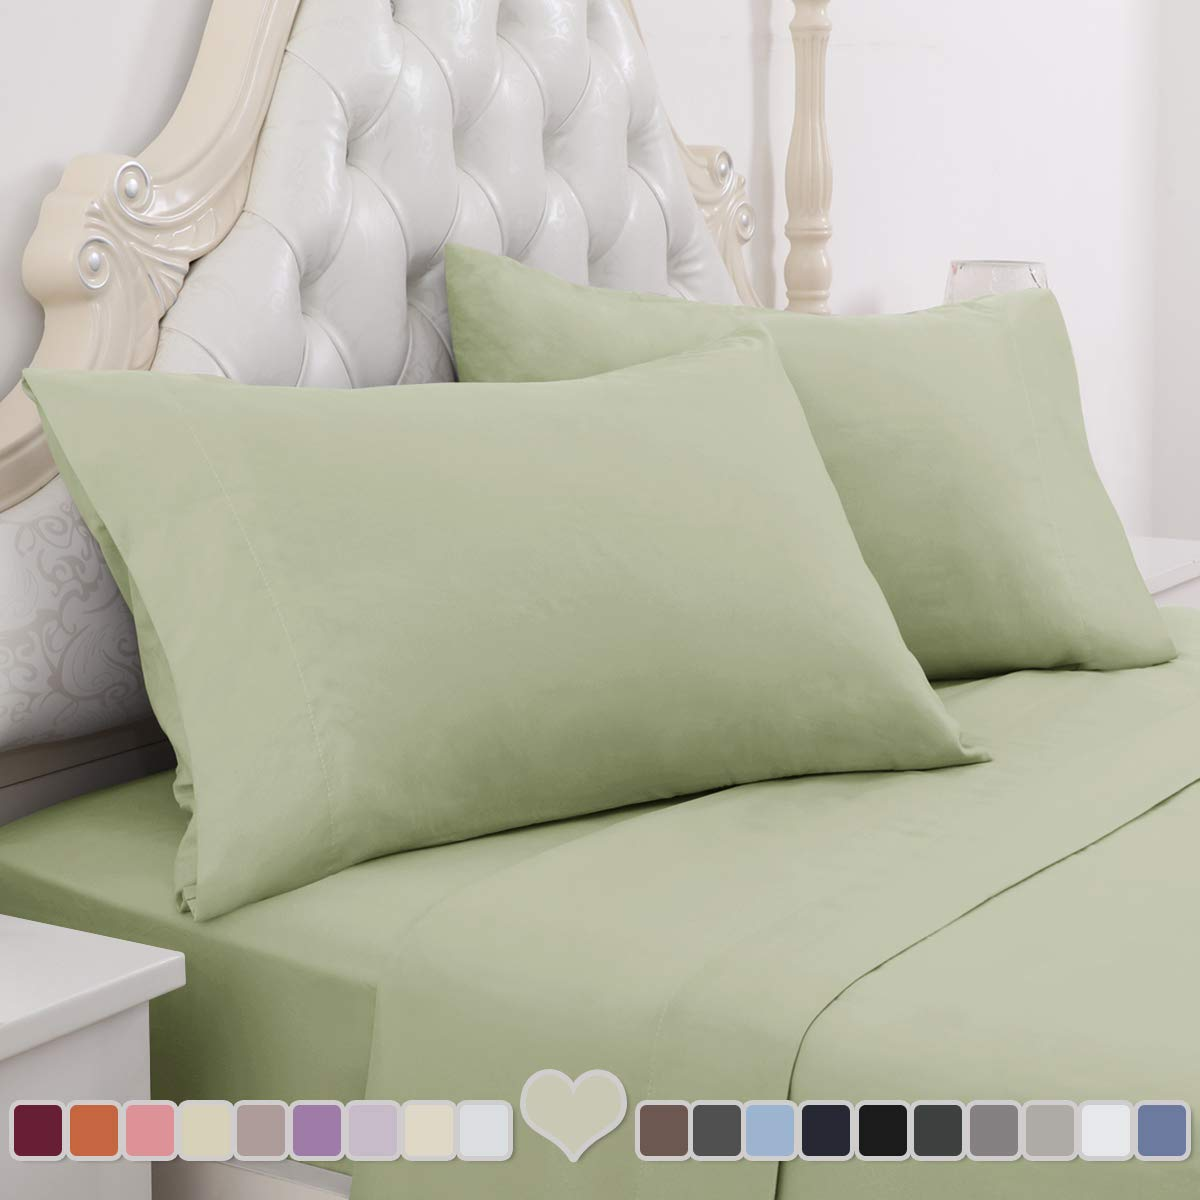 HOMEIDEAS 4 Piece Bed Sheet Set (King, Sage Green) 100% Brushed Microfiber 1800 Bedding Sheets - Deep Pockets, Hypoallergenic, Wrinkle & Fade Resistant